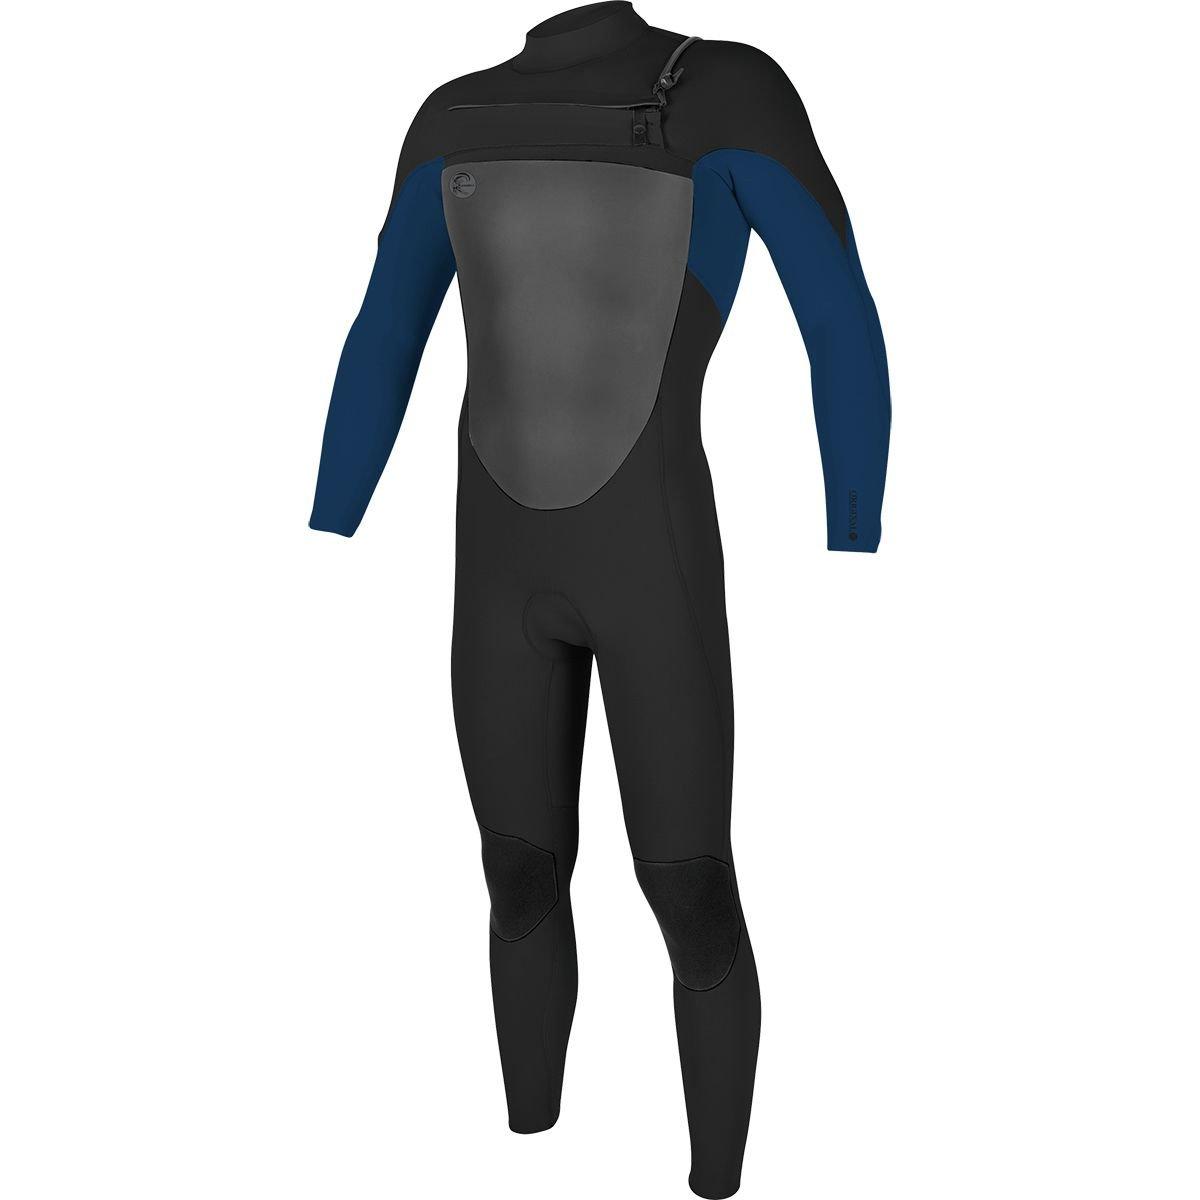 O'Neill Men's O'Riginal 3/2 mm Chest Zip Full Wetsuit, Black/Deepsea, X-Small